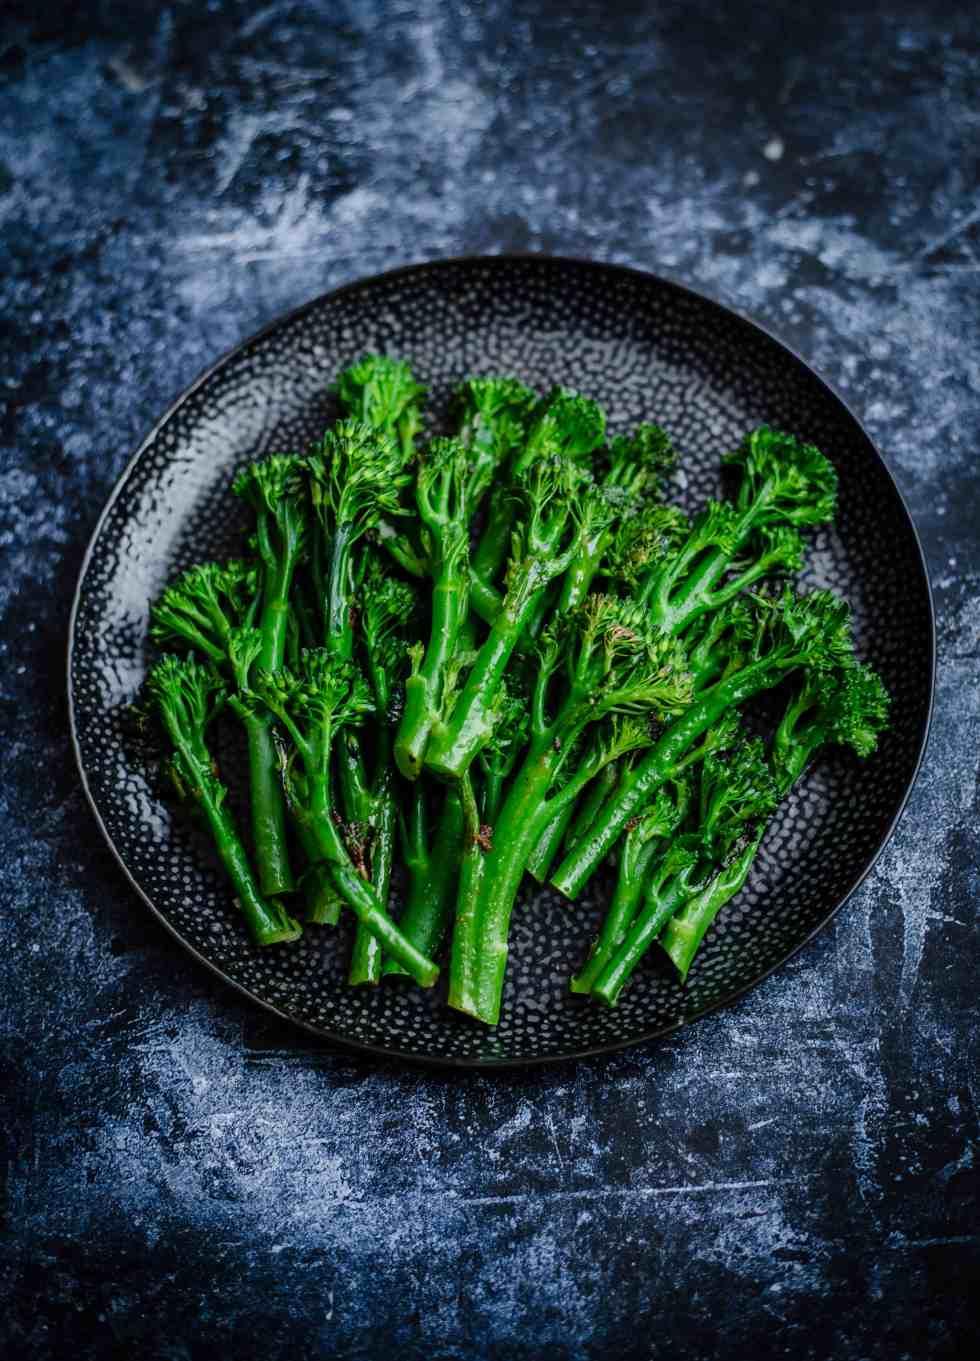 Tendereste Broccoli in a plate